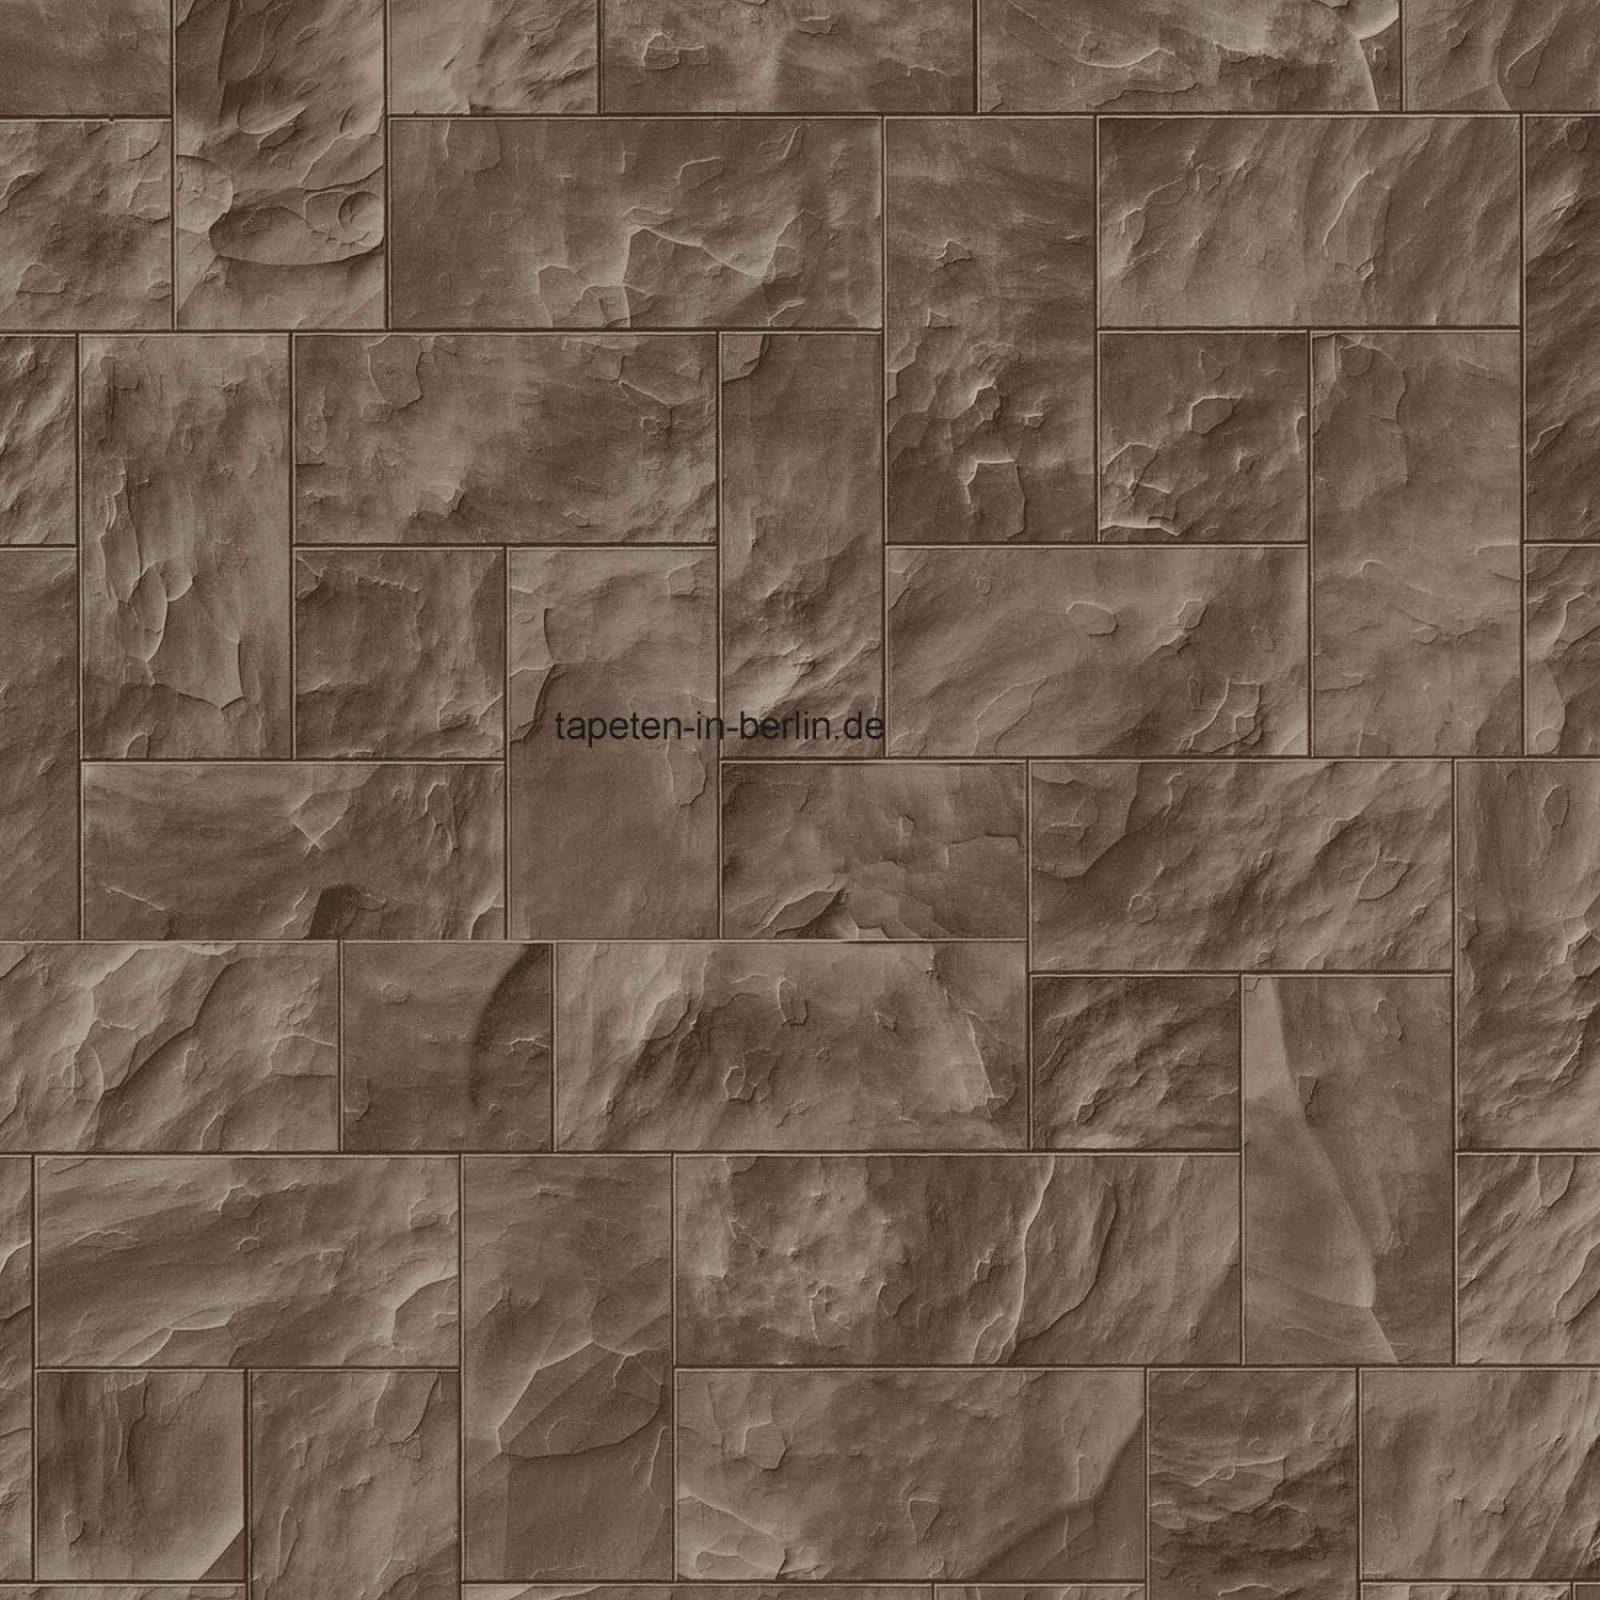 Awesome Steintapeten In 3D Optik Grau Beige Braun Wohnzimmer von Steintapeten In 3D Optik Bild